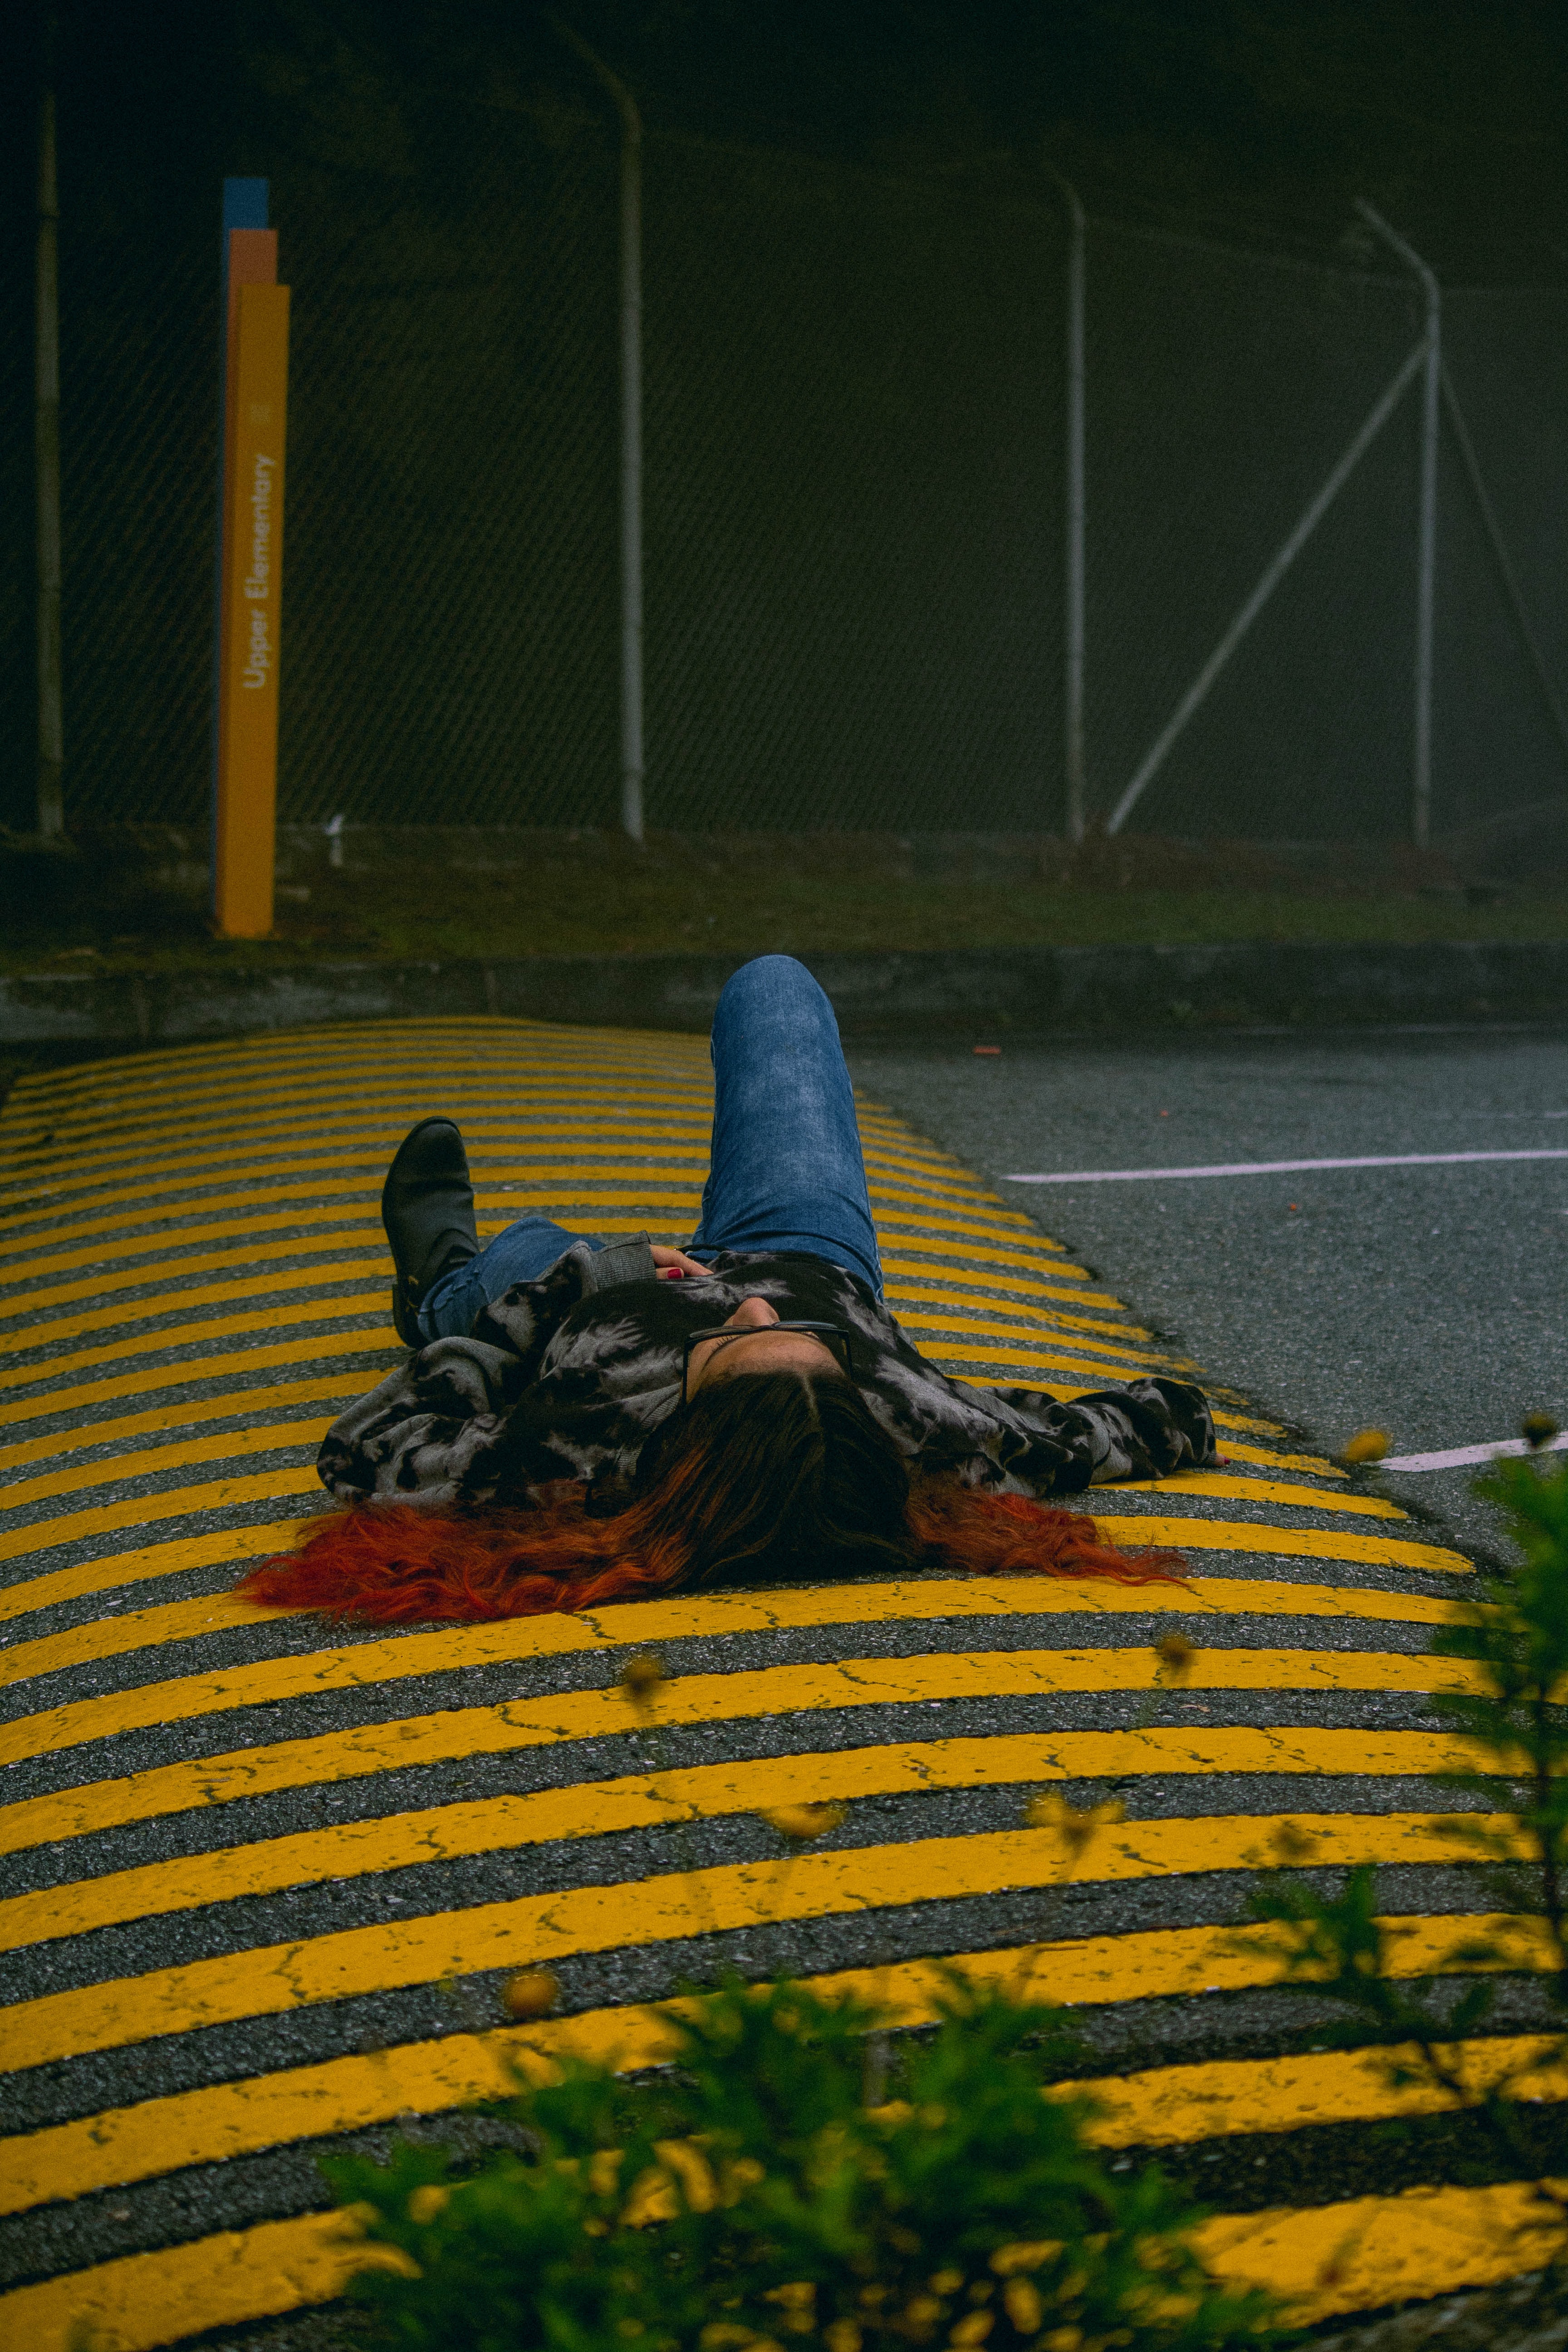 person lying on pedestrian crossing